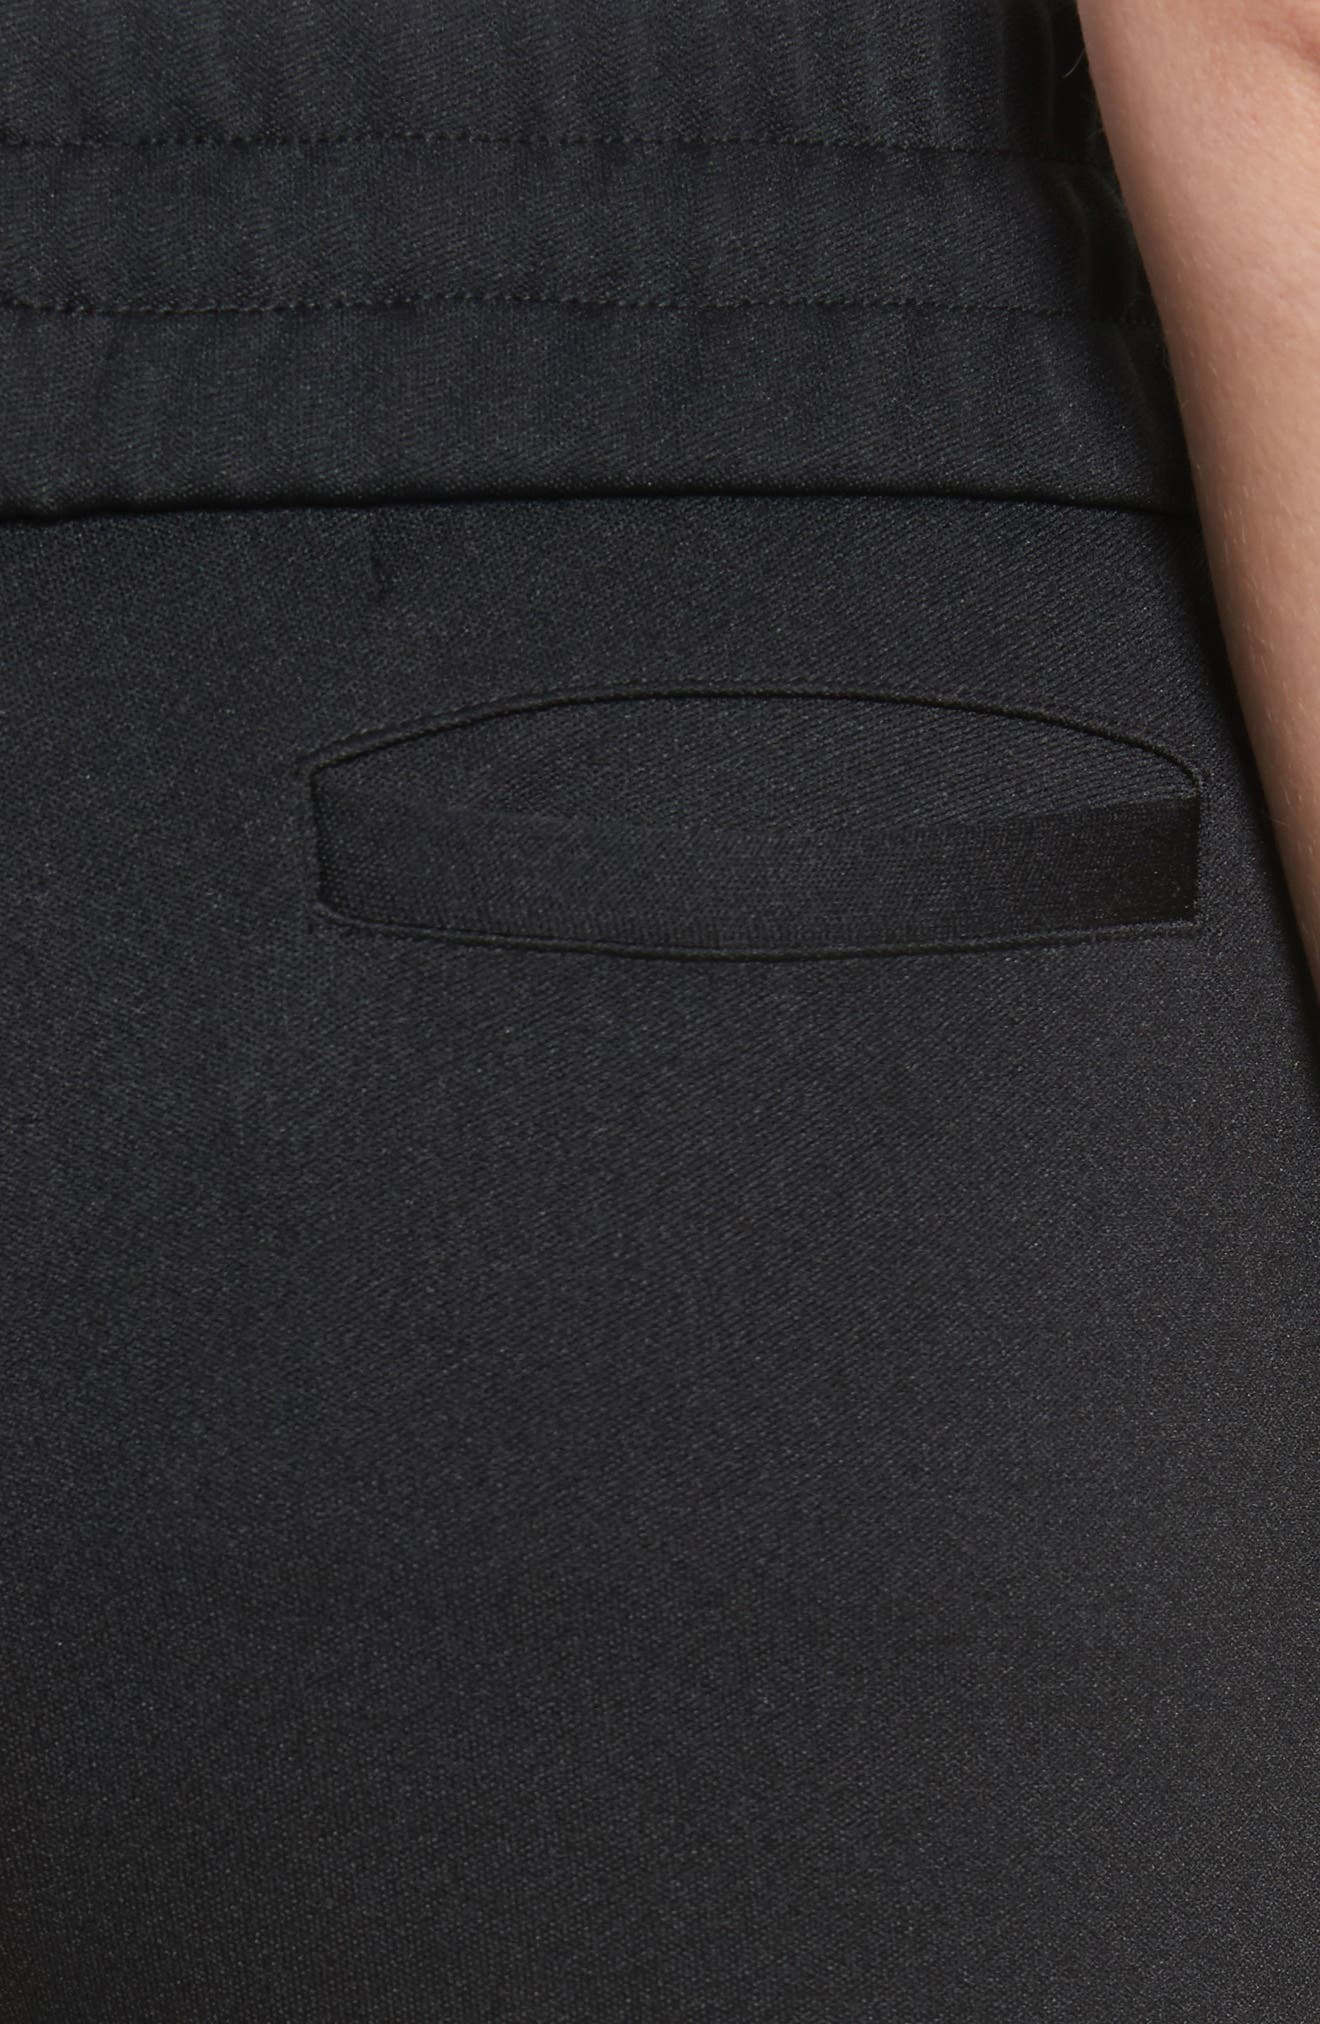 Flare Leg Track Pants,                             Alternate thumbnail 5, color,                             Black/ No Color